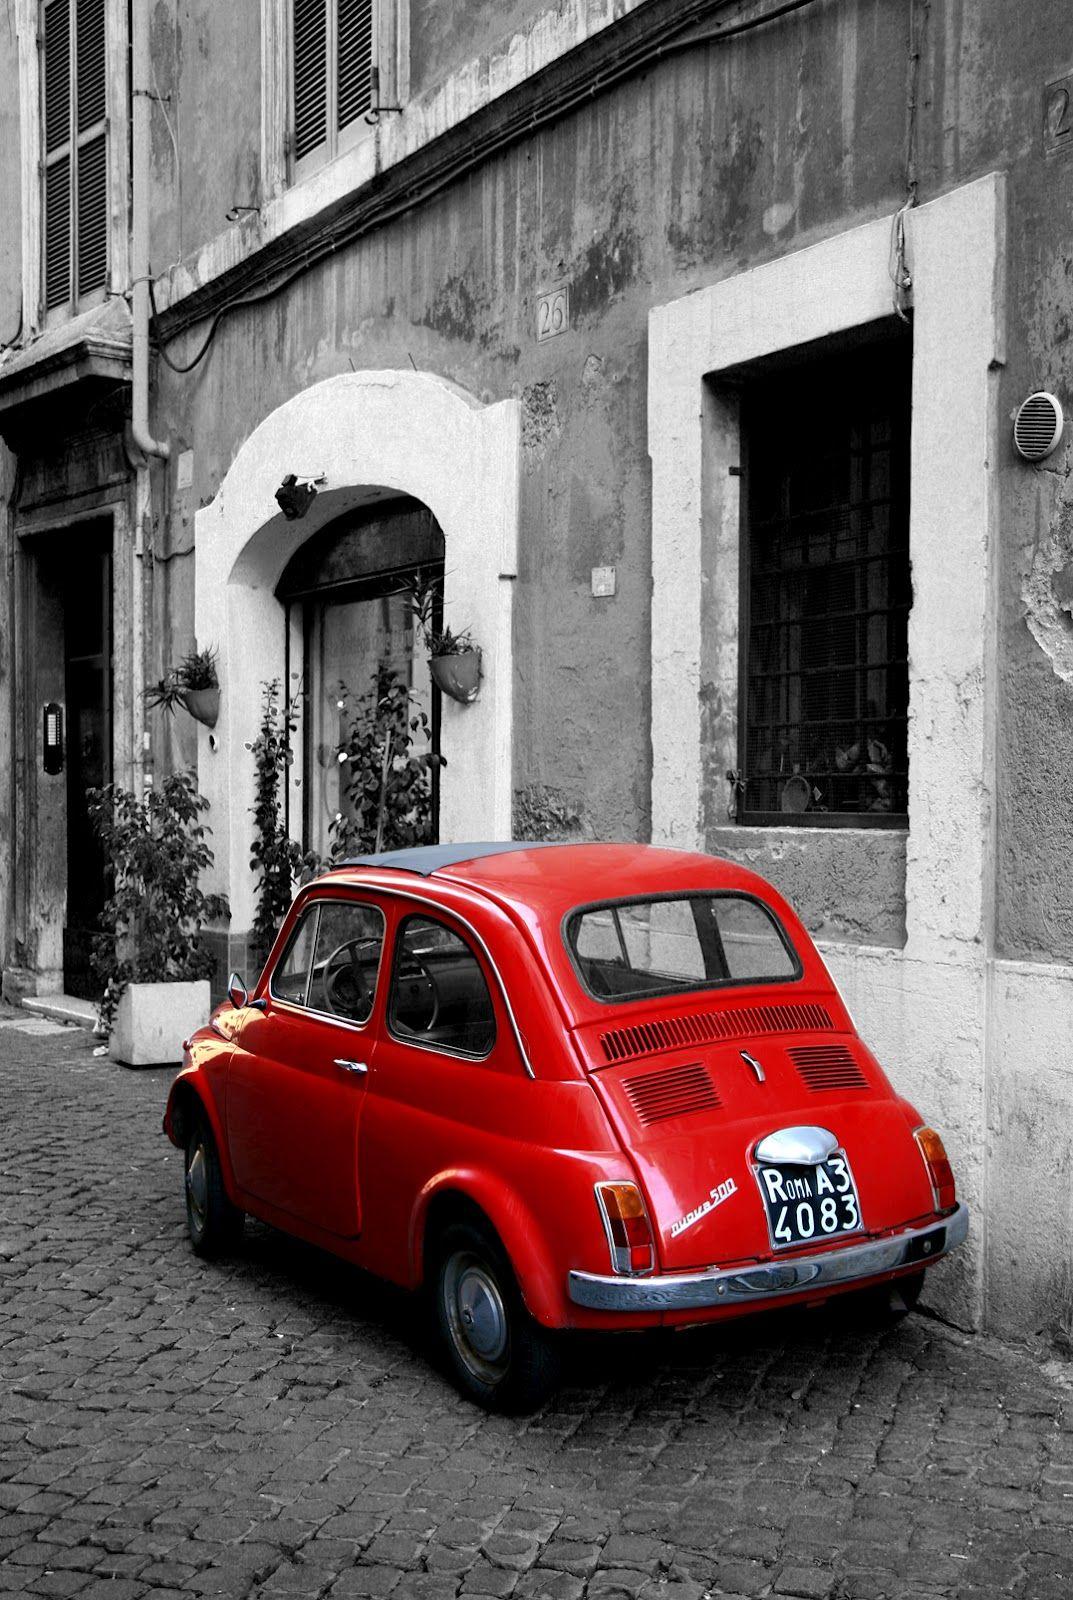 trastevere roma italy algo t pico de italia coches peque os calles adoquinadas y edificios. Black Bedroom Furniture Sets. Home Design Ideas